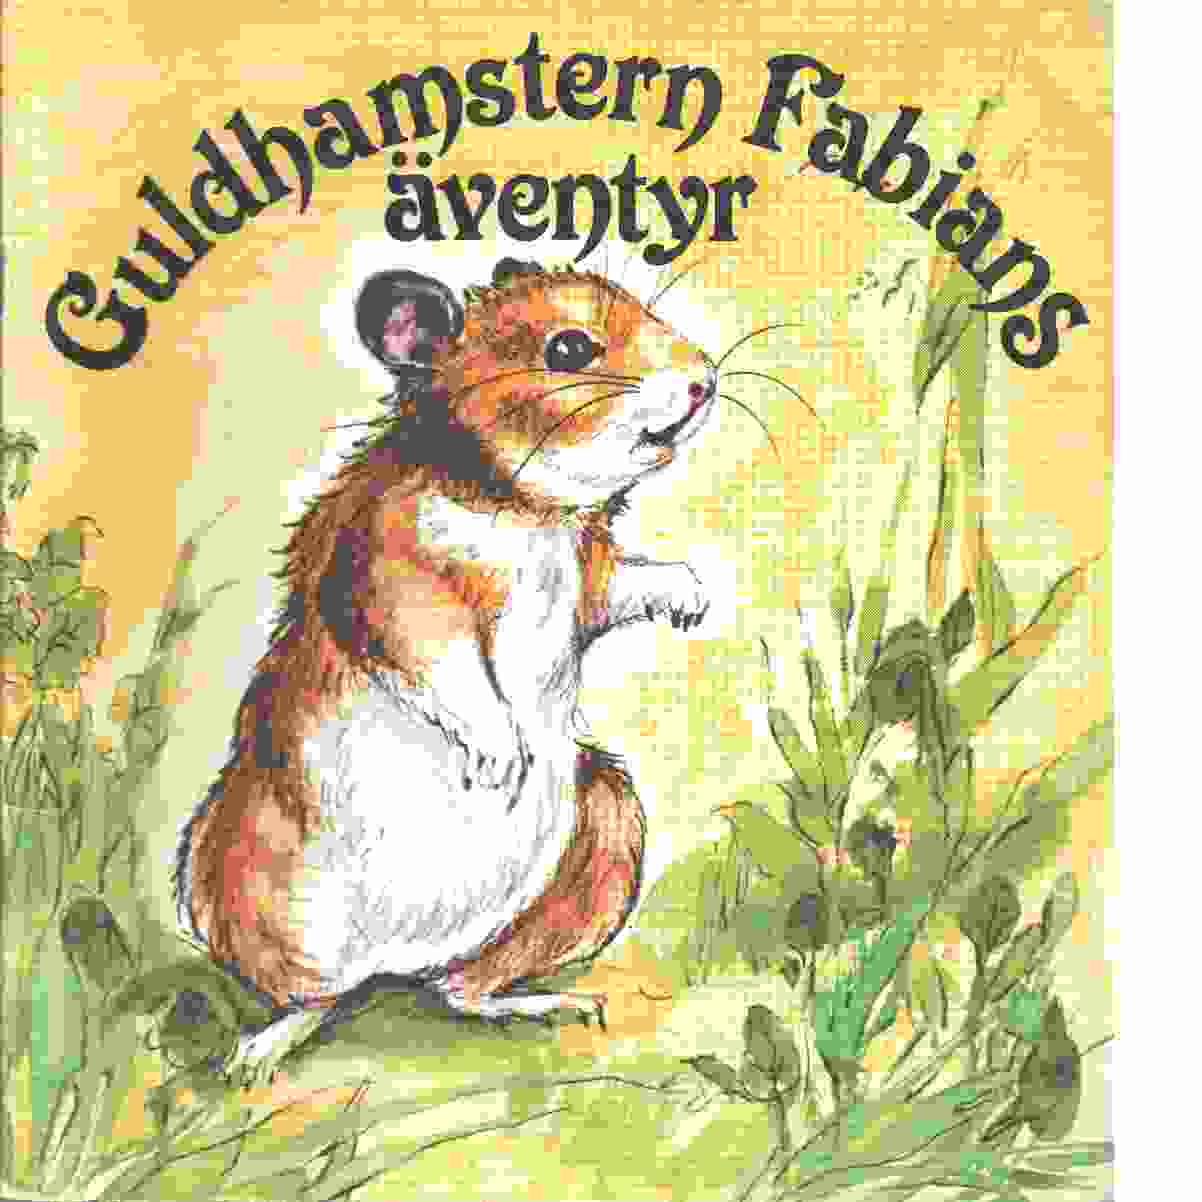 Guldhamstern Fabians äventyr -  Valisa och Laury, Claire